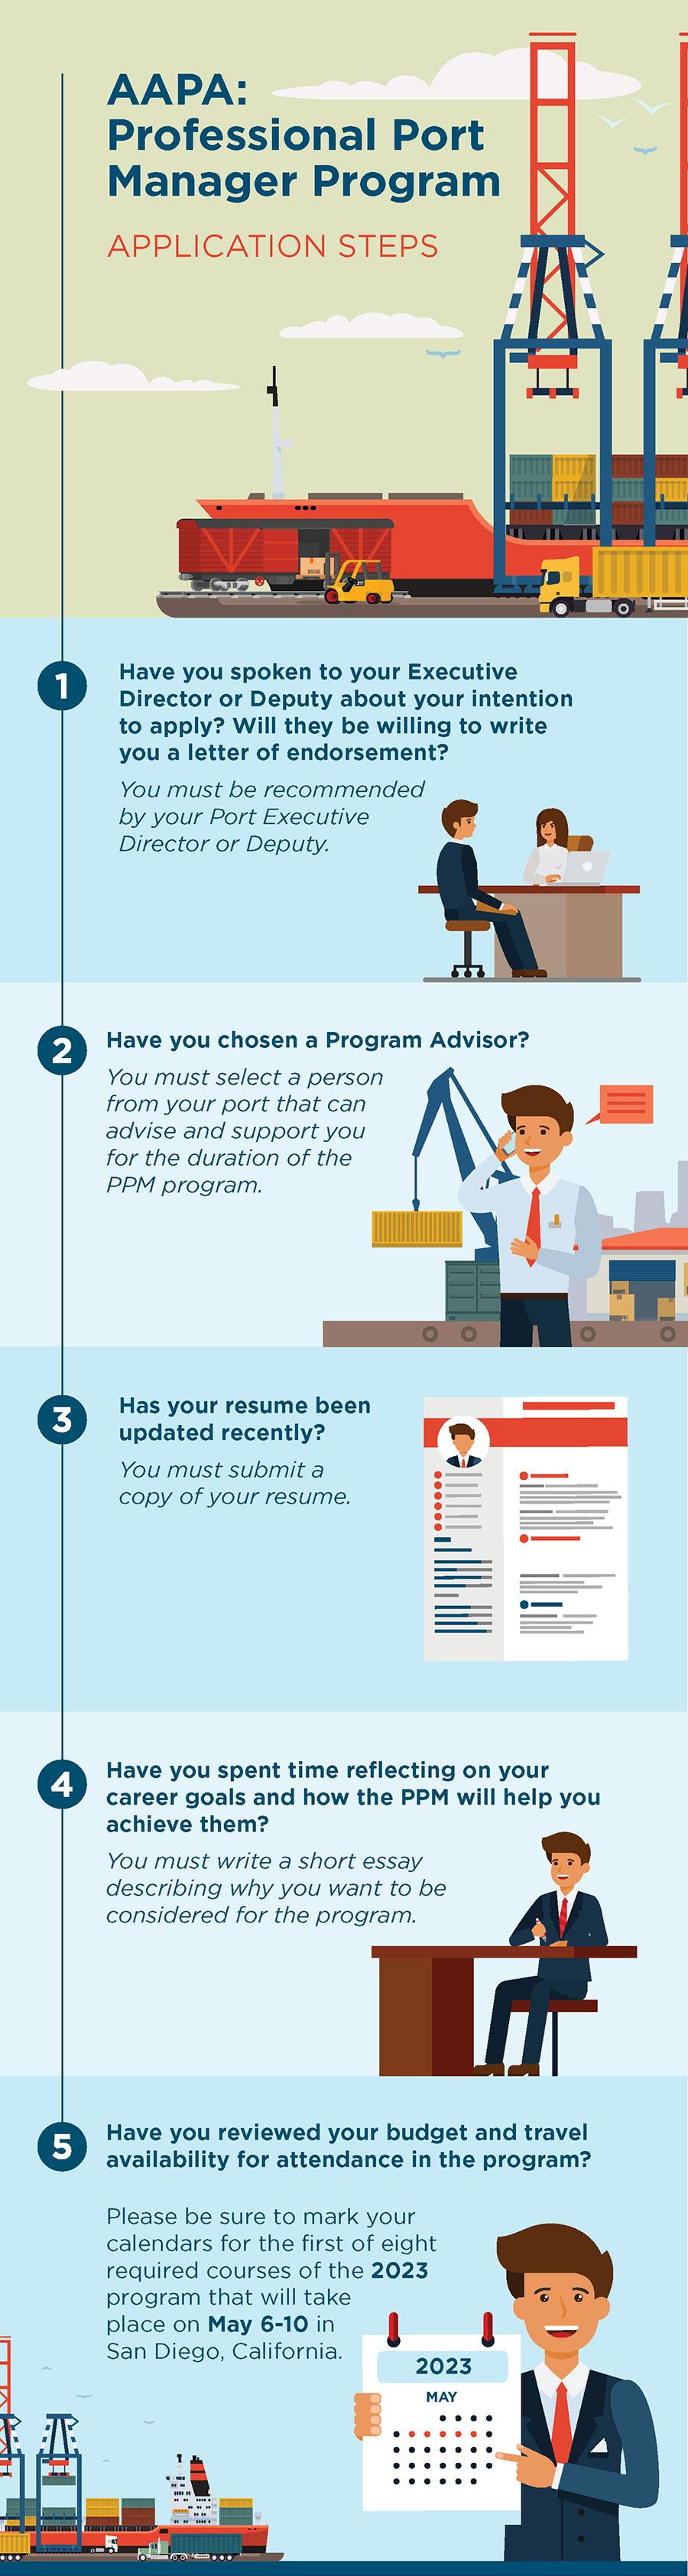 Professional Port Manager Ppm Certification Program